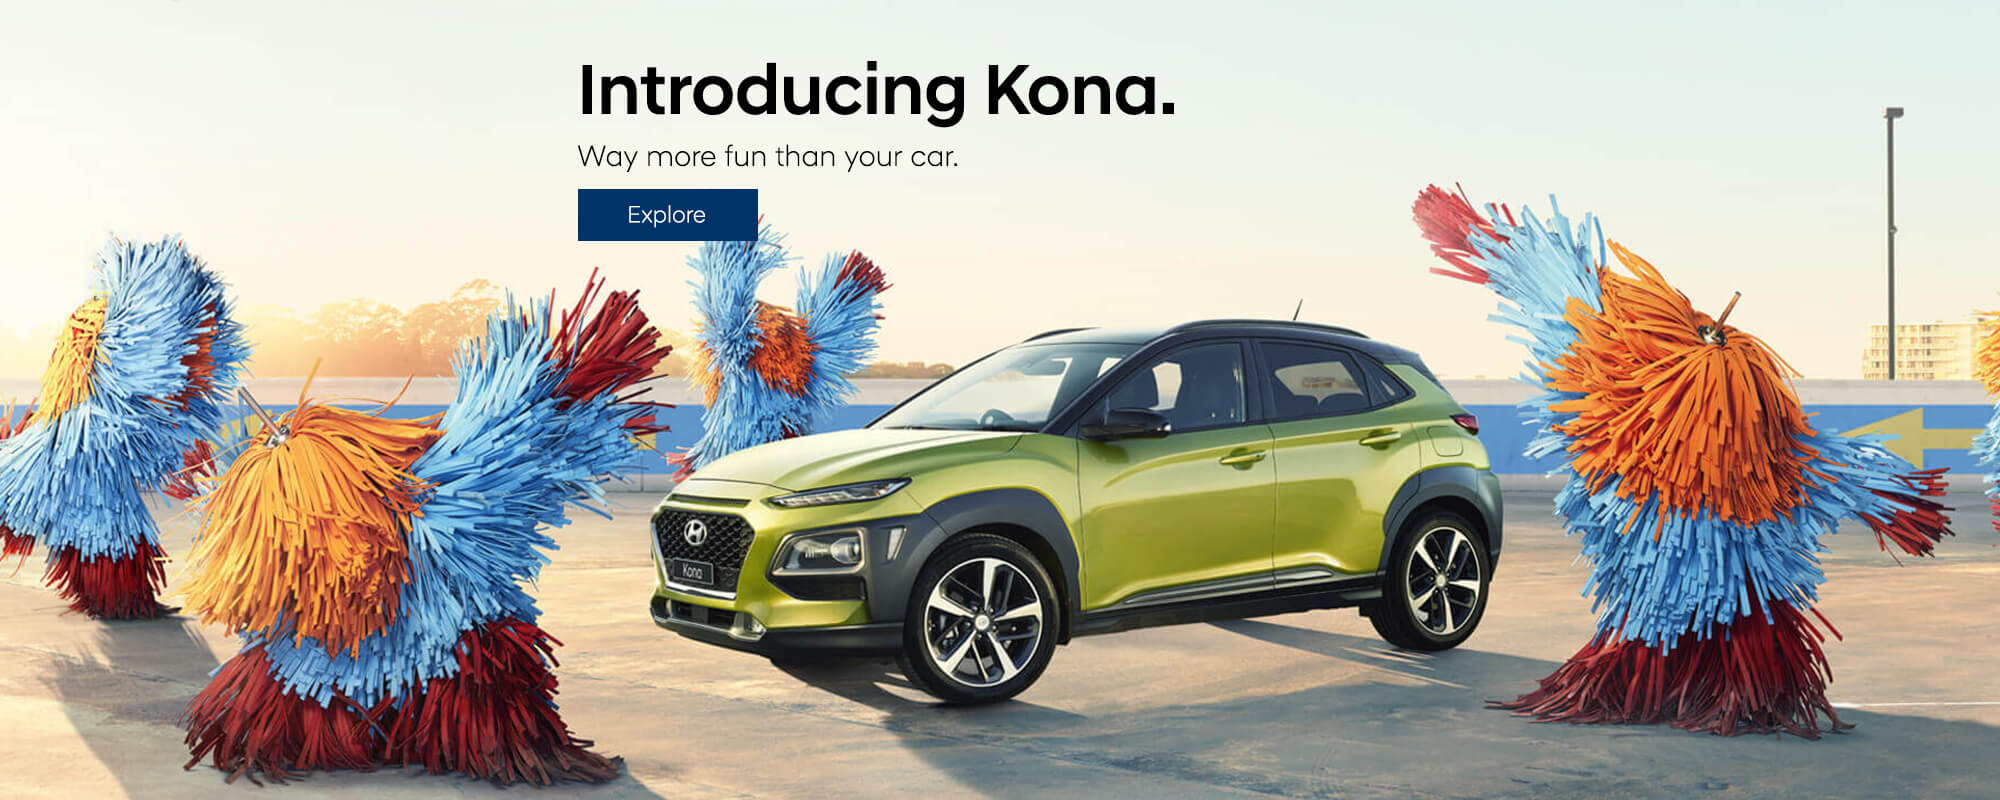 The All-New Kona